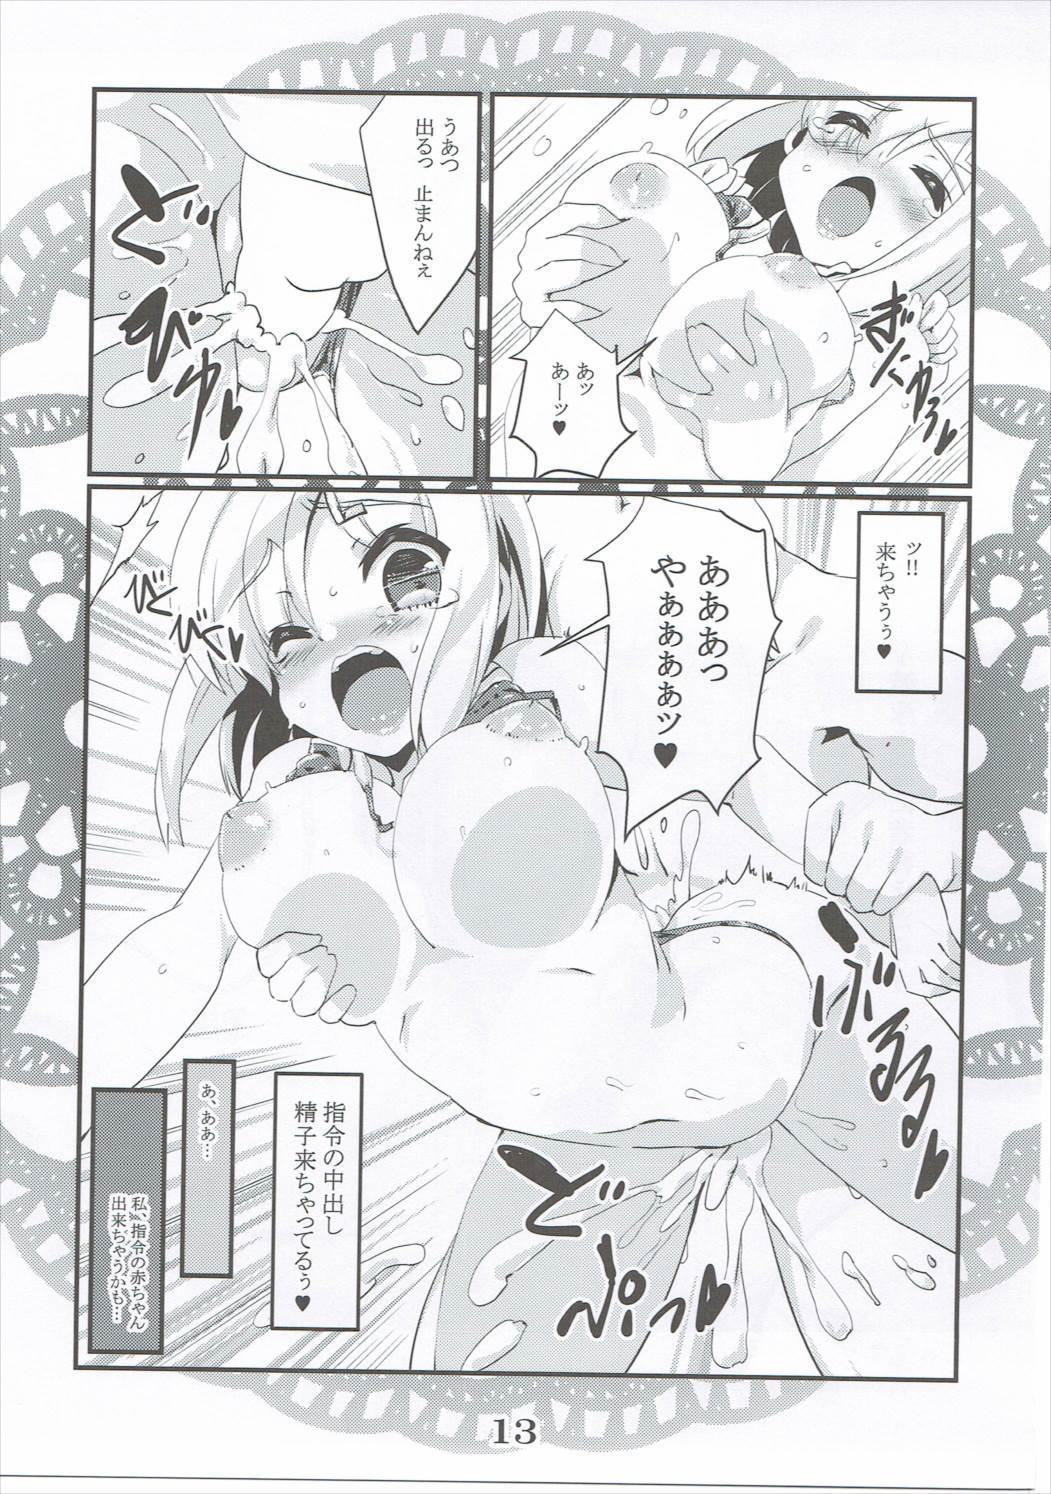 Rensou Harugatari 20 11